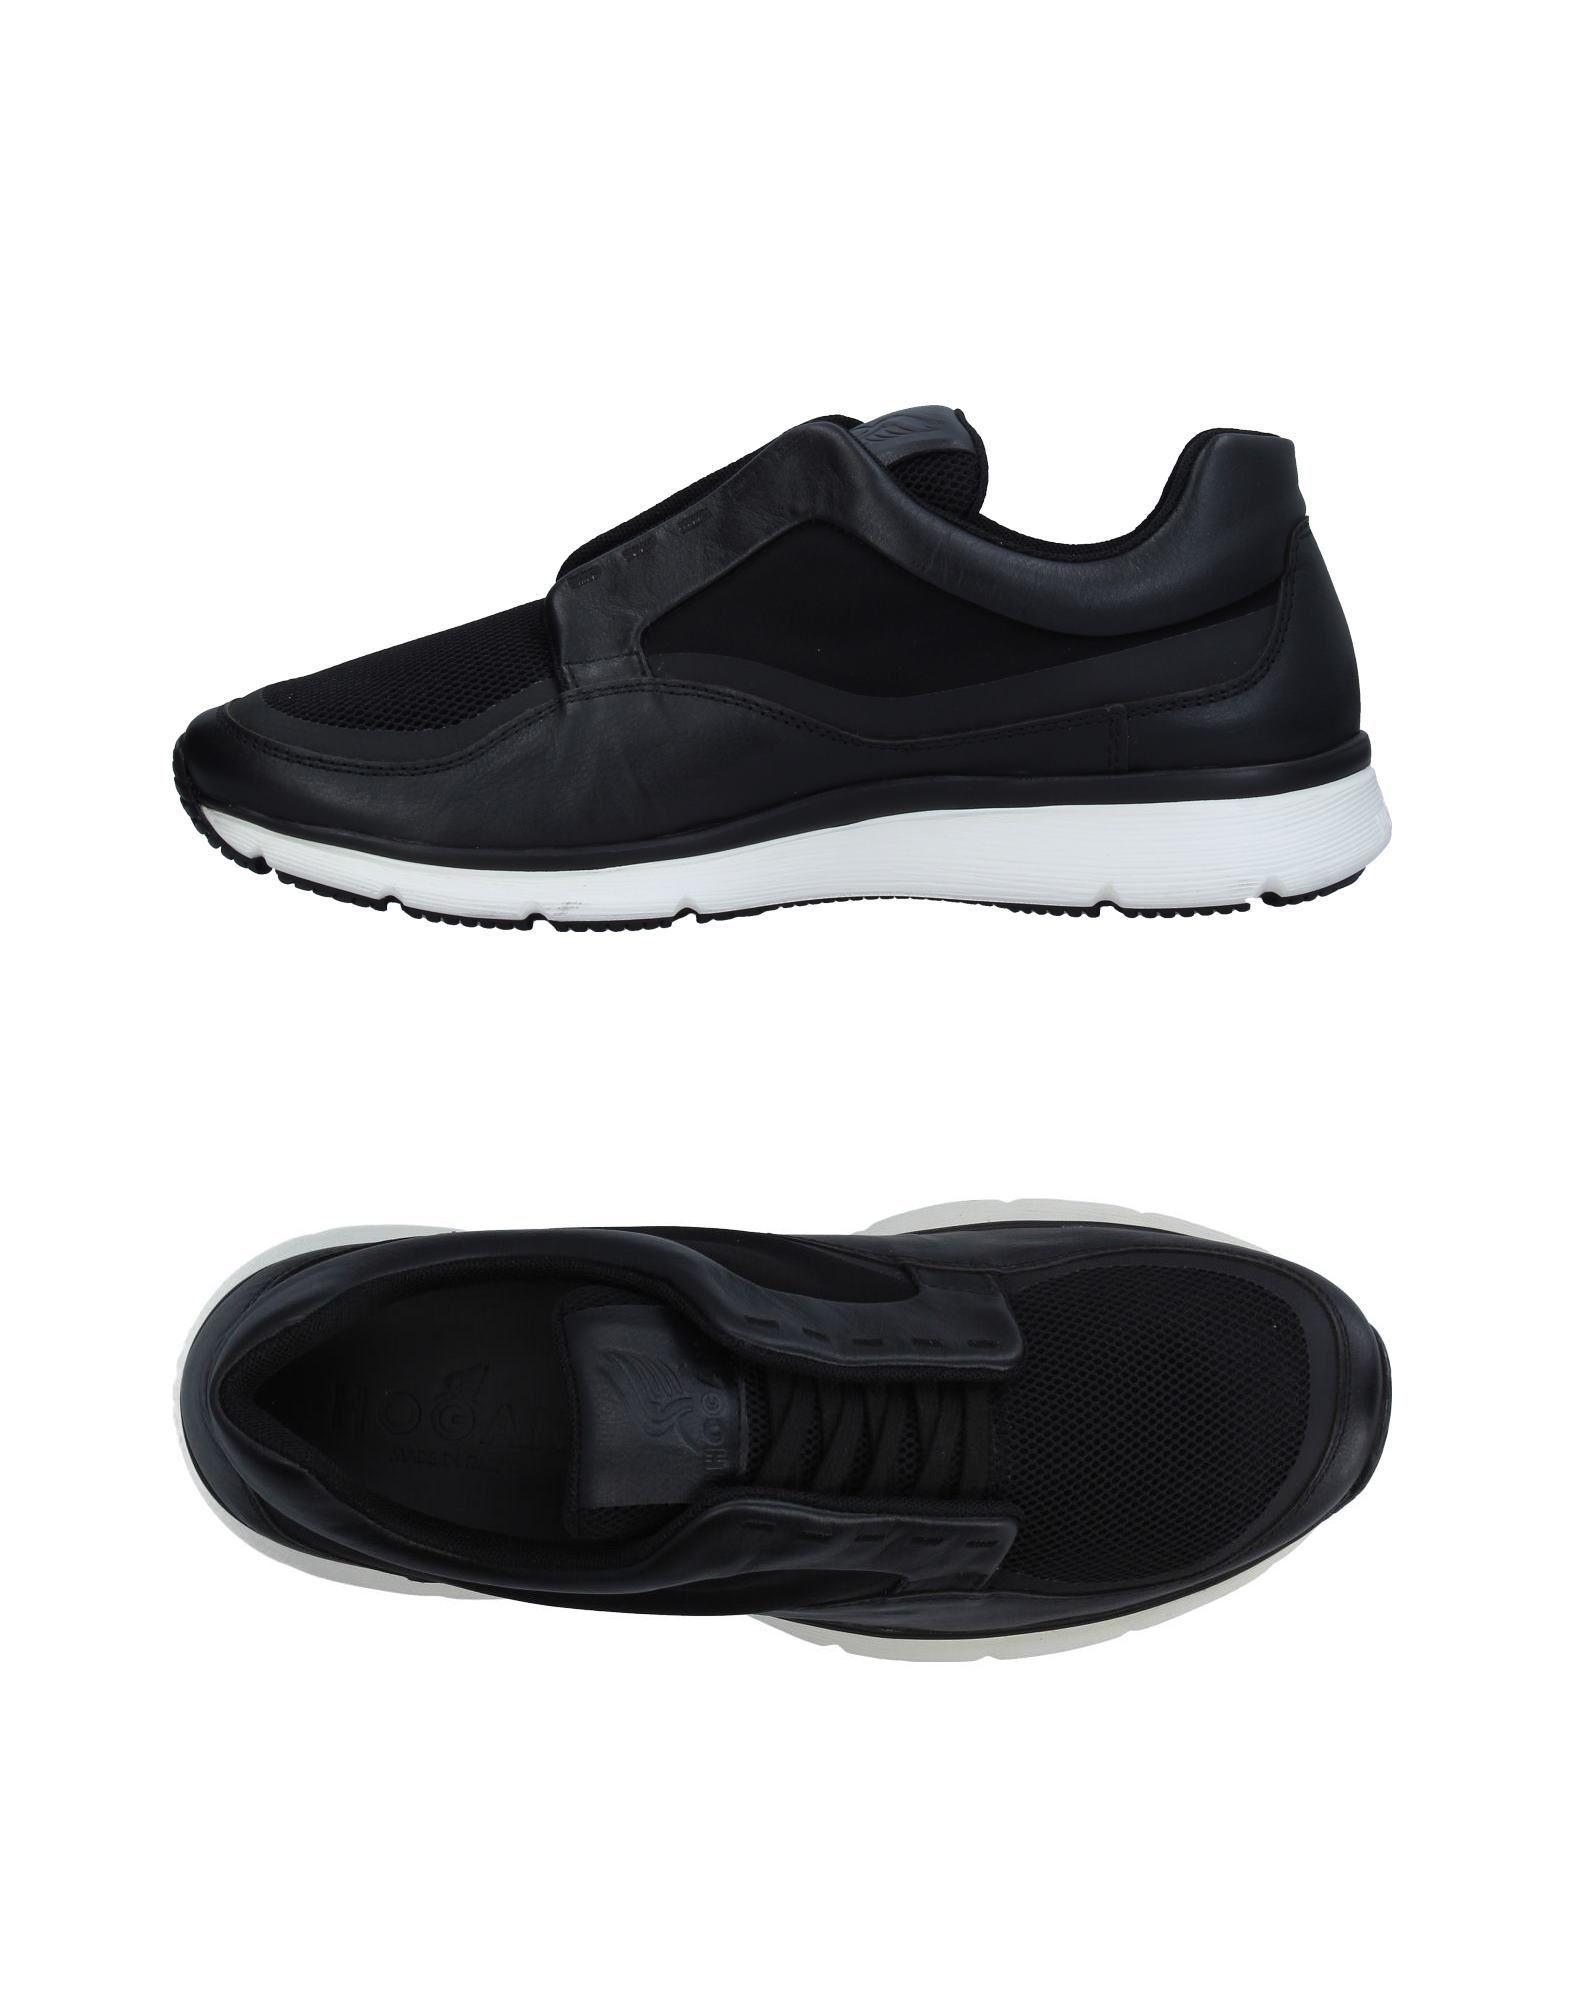 Hogan Sneakers Herren  11335854CT Gute Qualität beliebte Schuhe